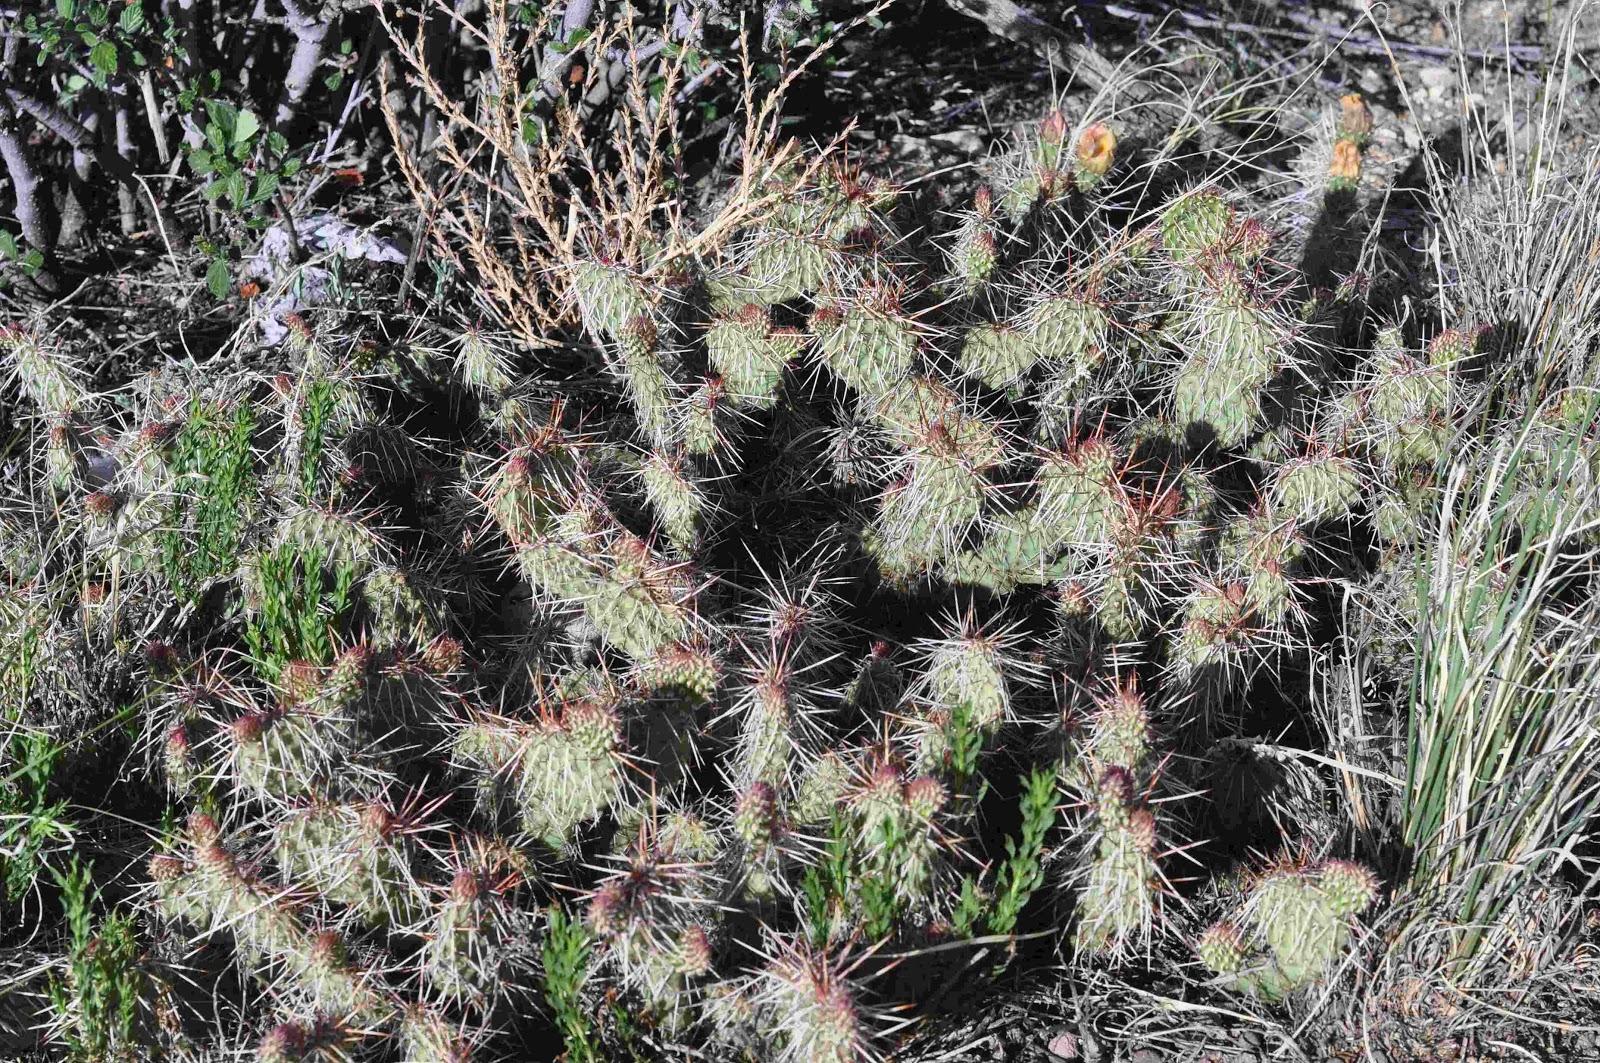 cactus Greencrest Buena Vista coloradoviews.filminspector.com